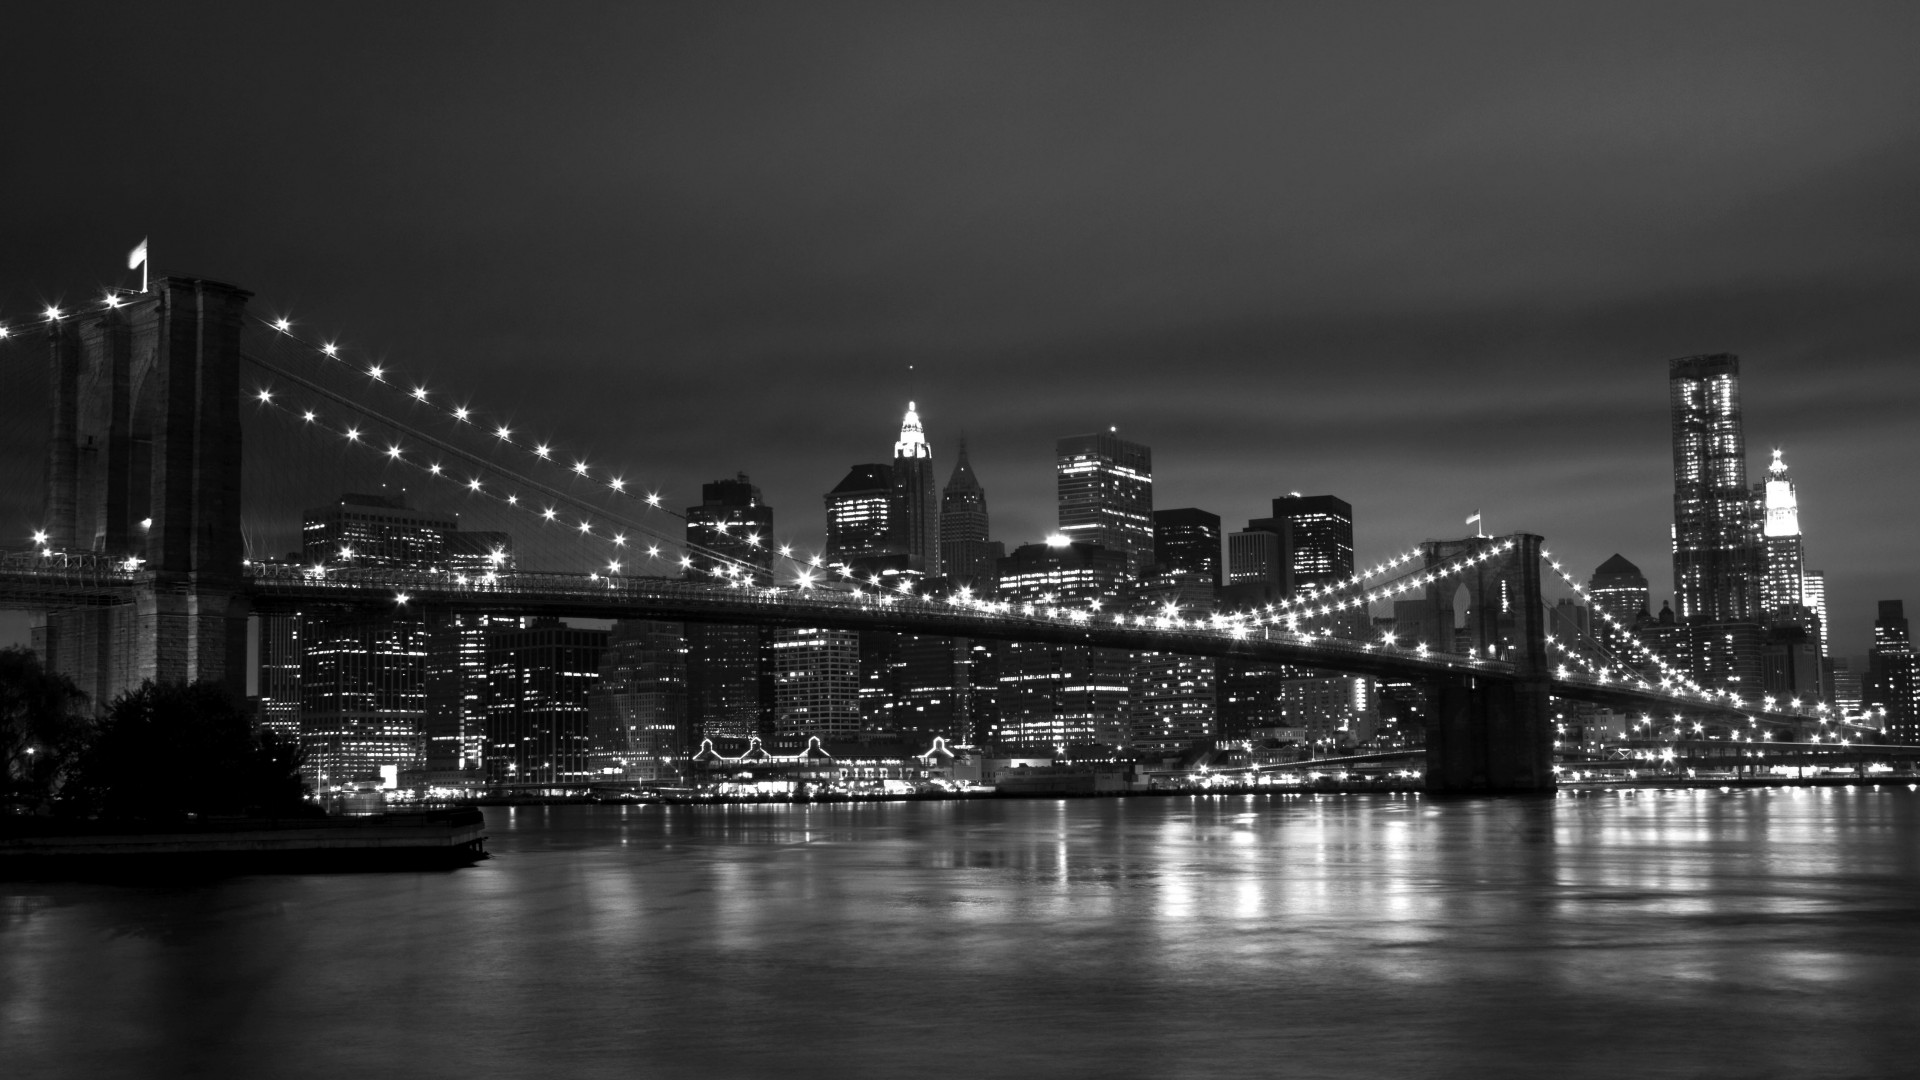 1920x1080 wallpaper city black - photo #12